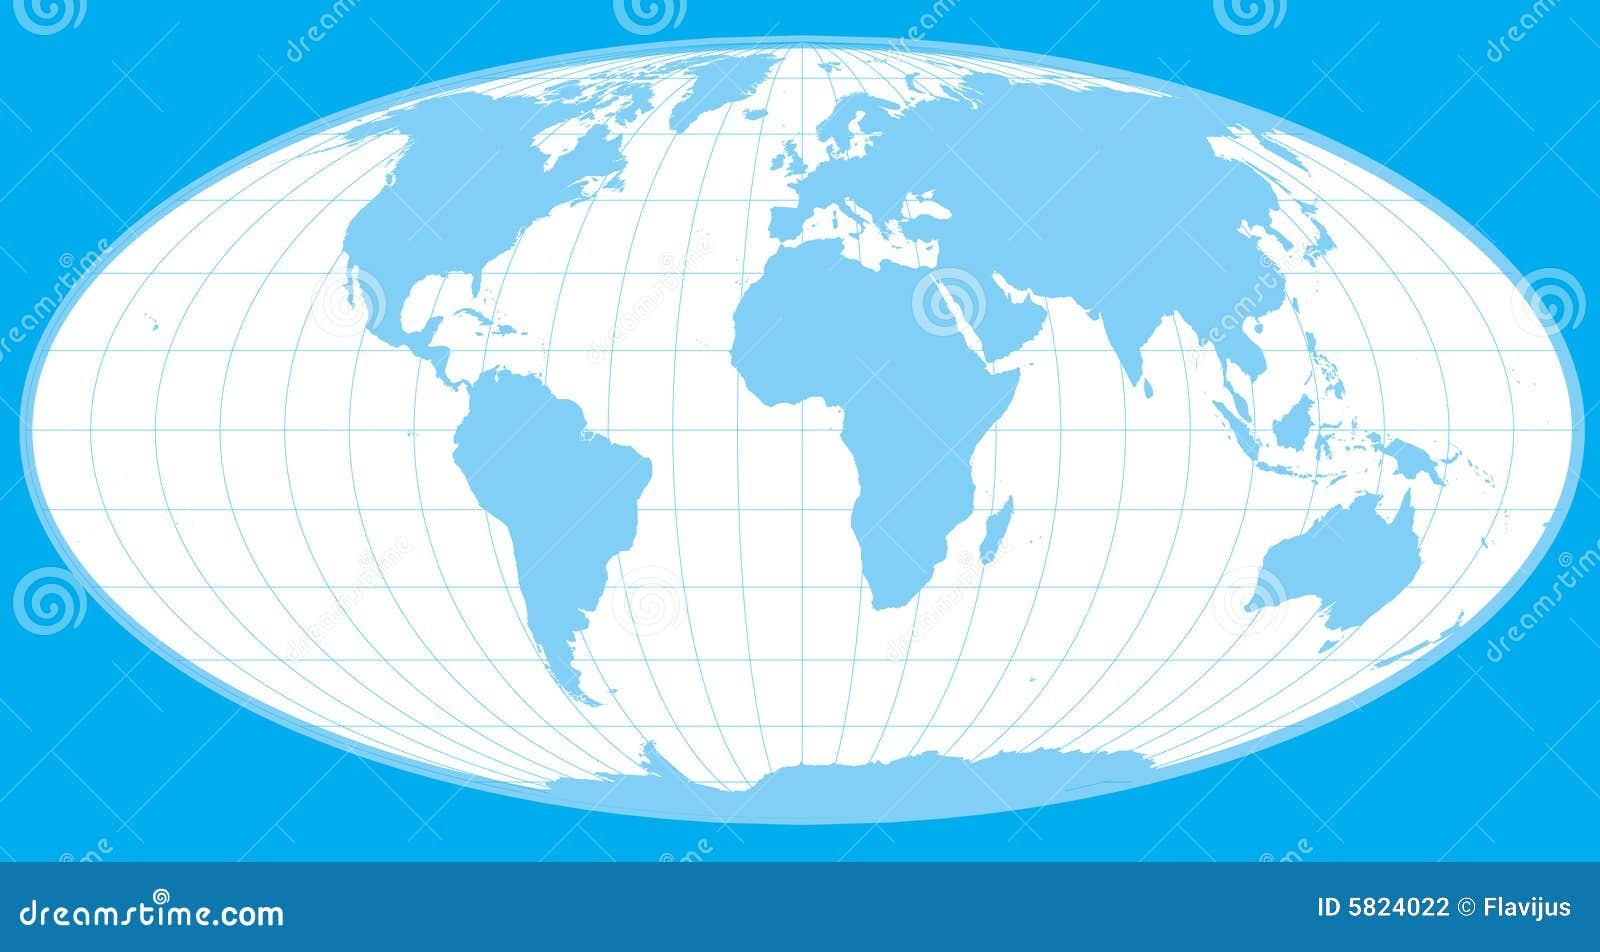 Blue vector world globe clip-art.